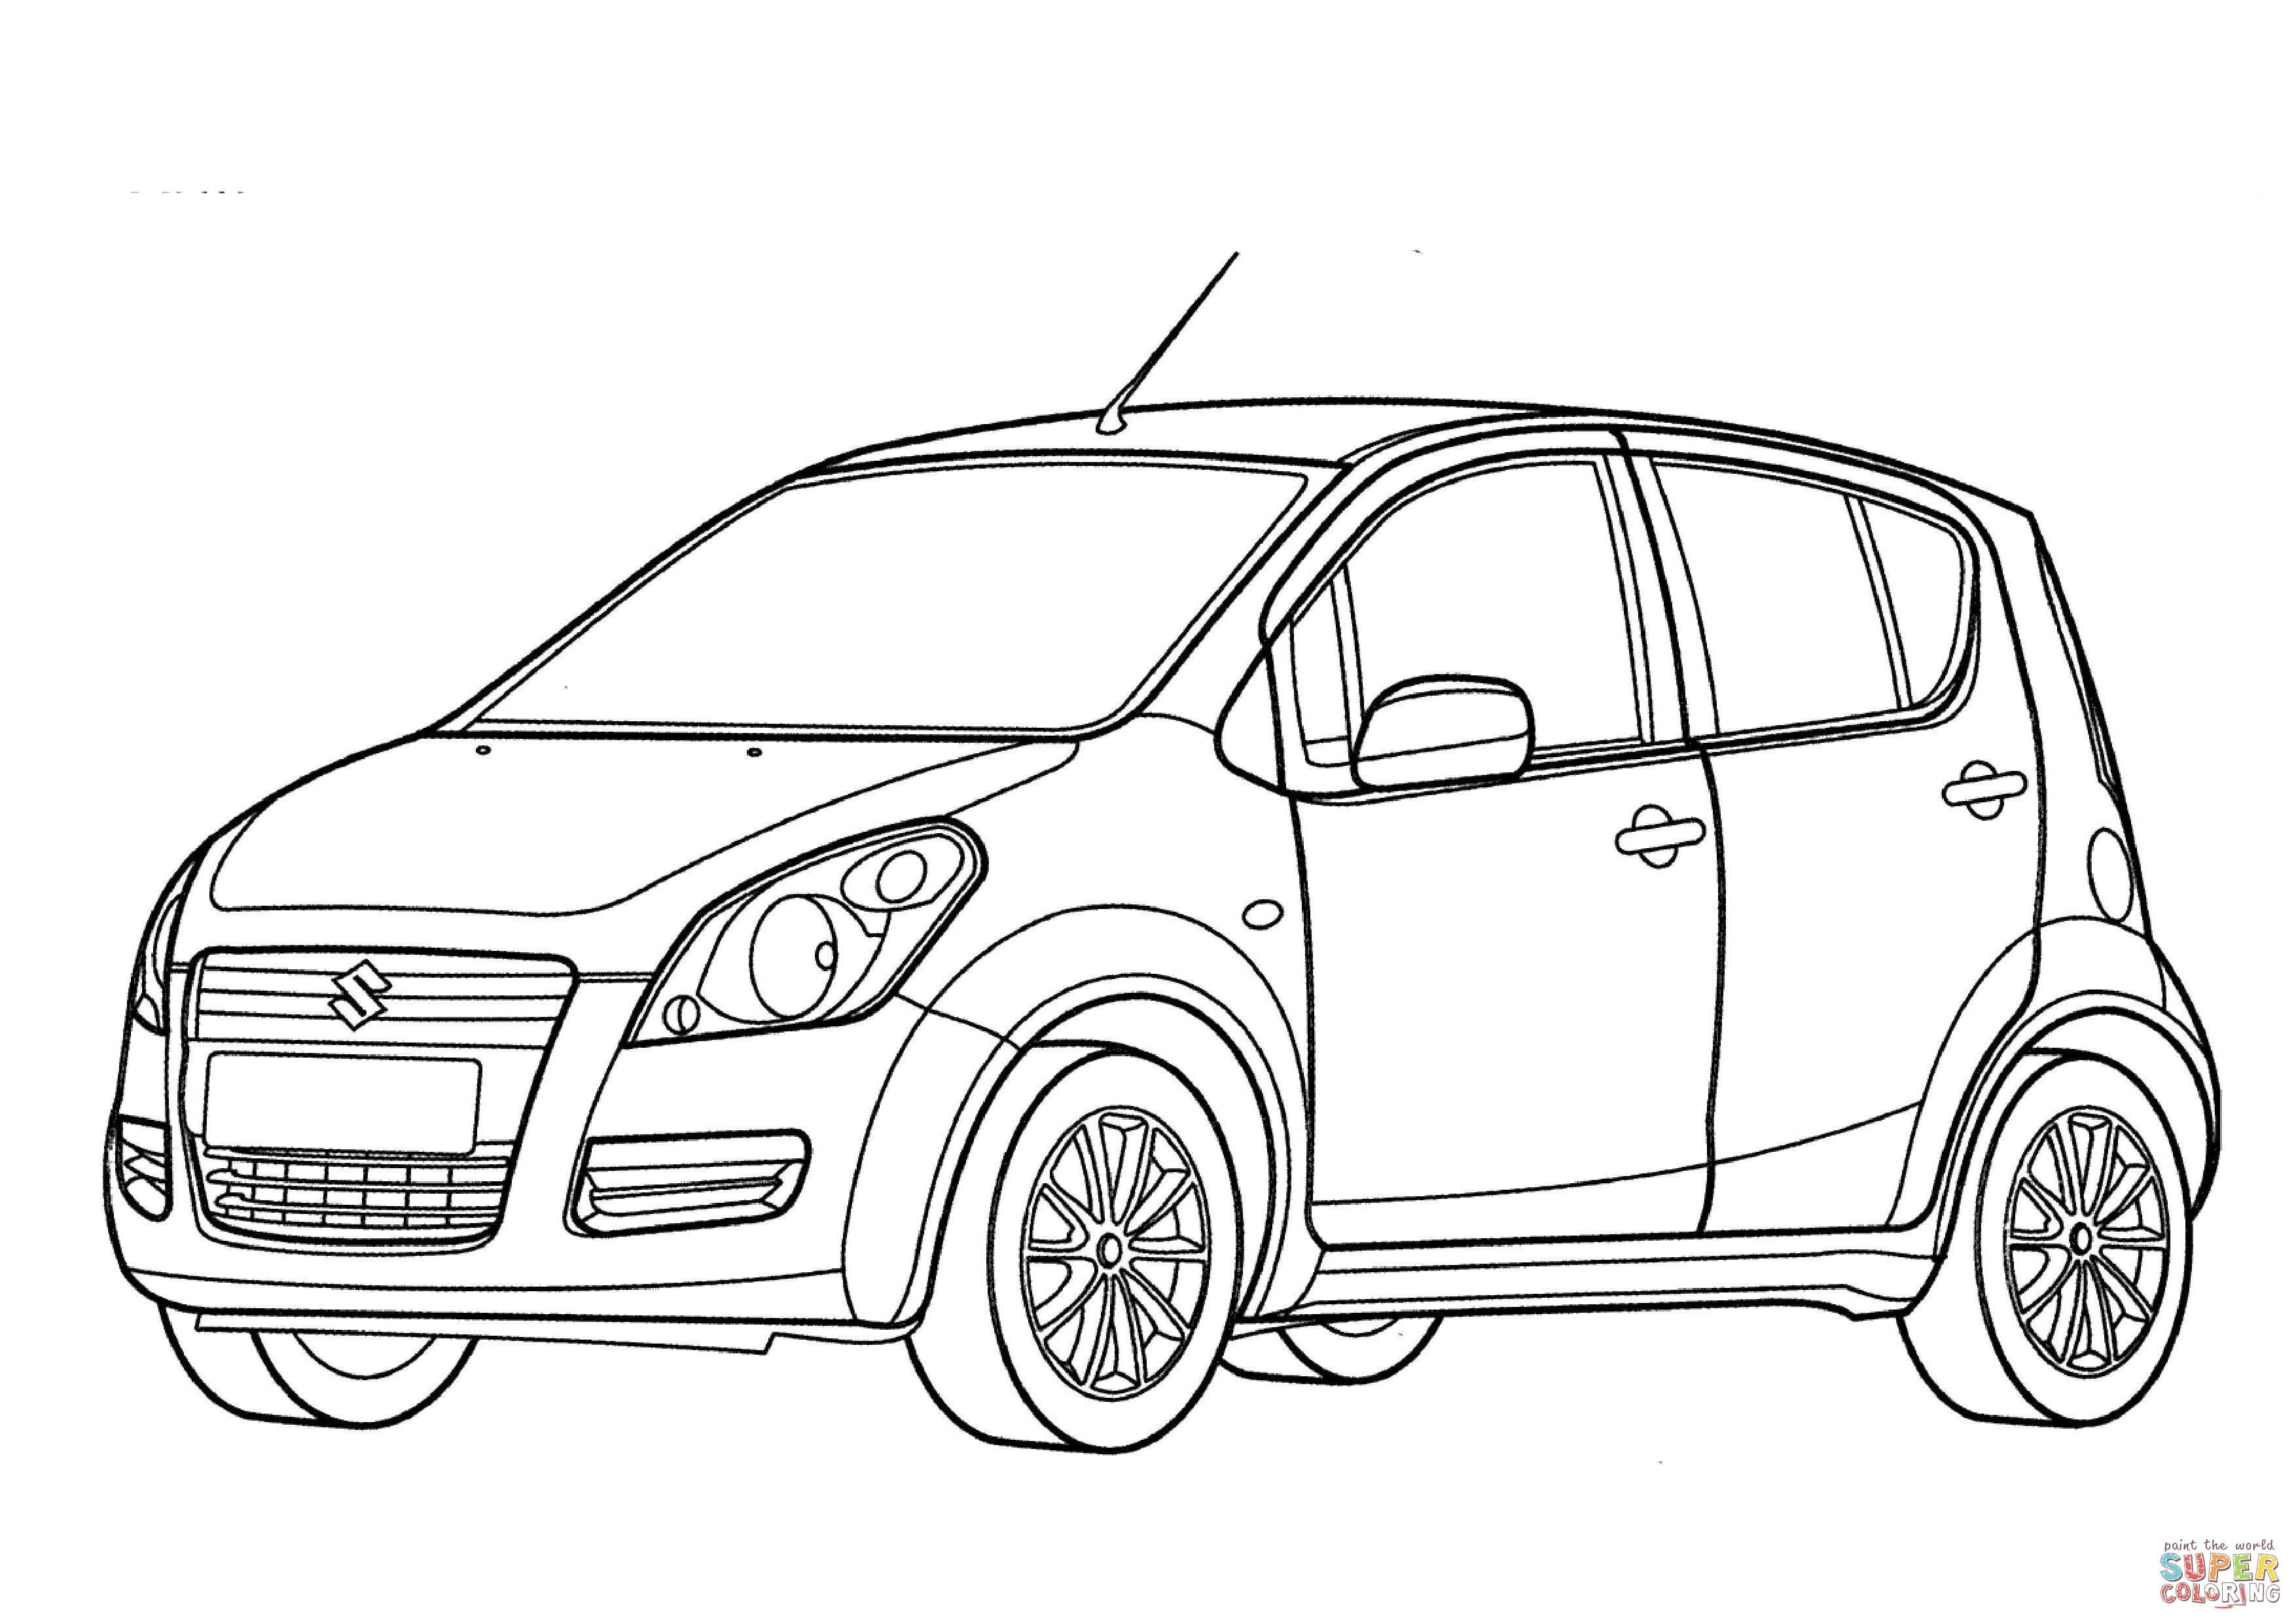 Hatchback Drawing At Getdrawings